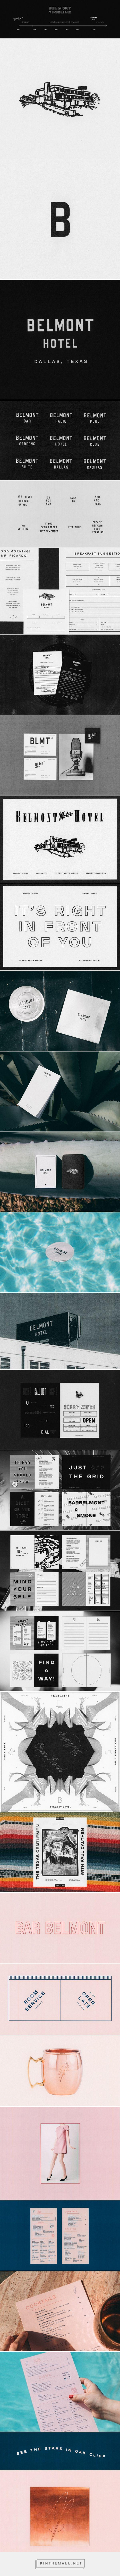 Belmont Hotel Branding Case Study - Tractorbeam - created via https://pinthemall.net